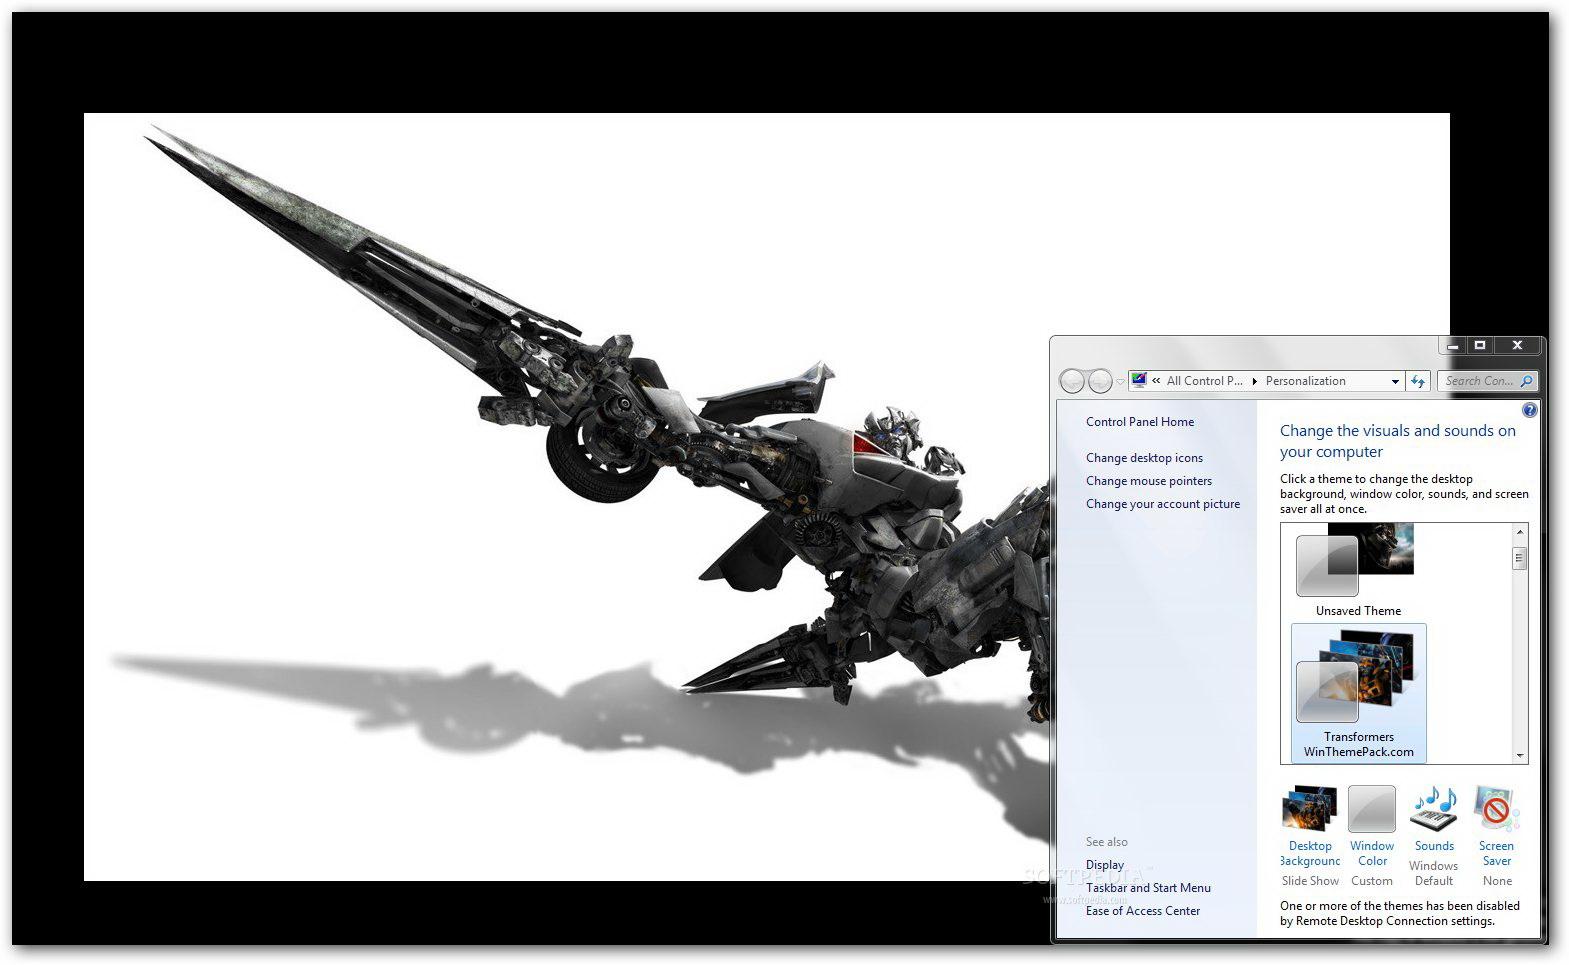 Transformers Windows Theme